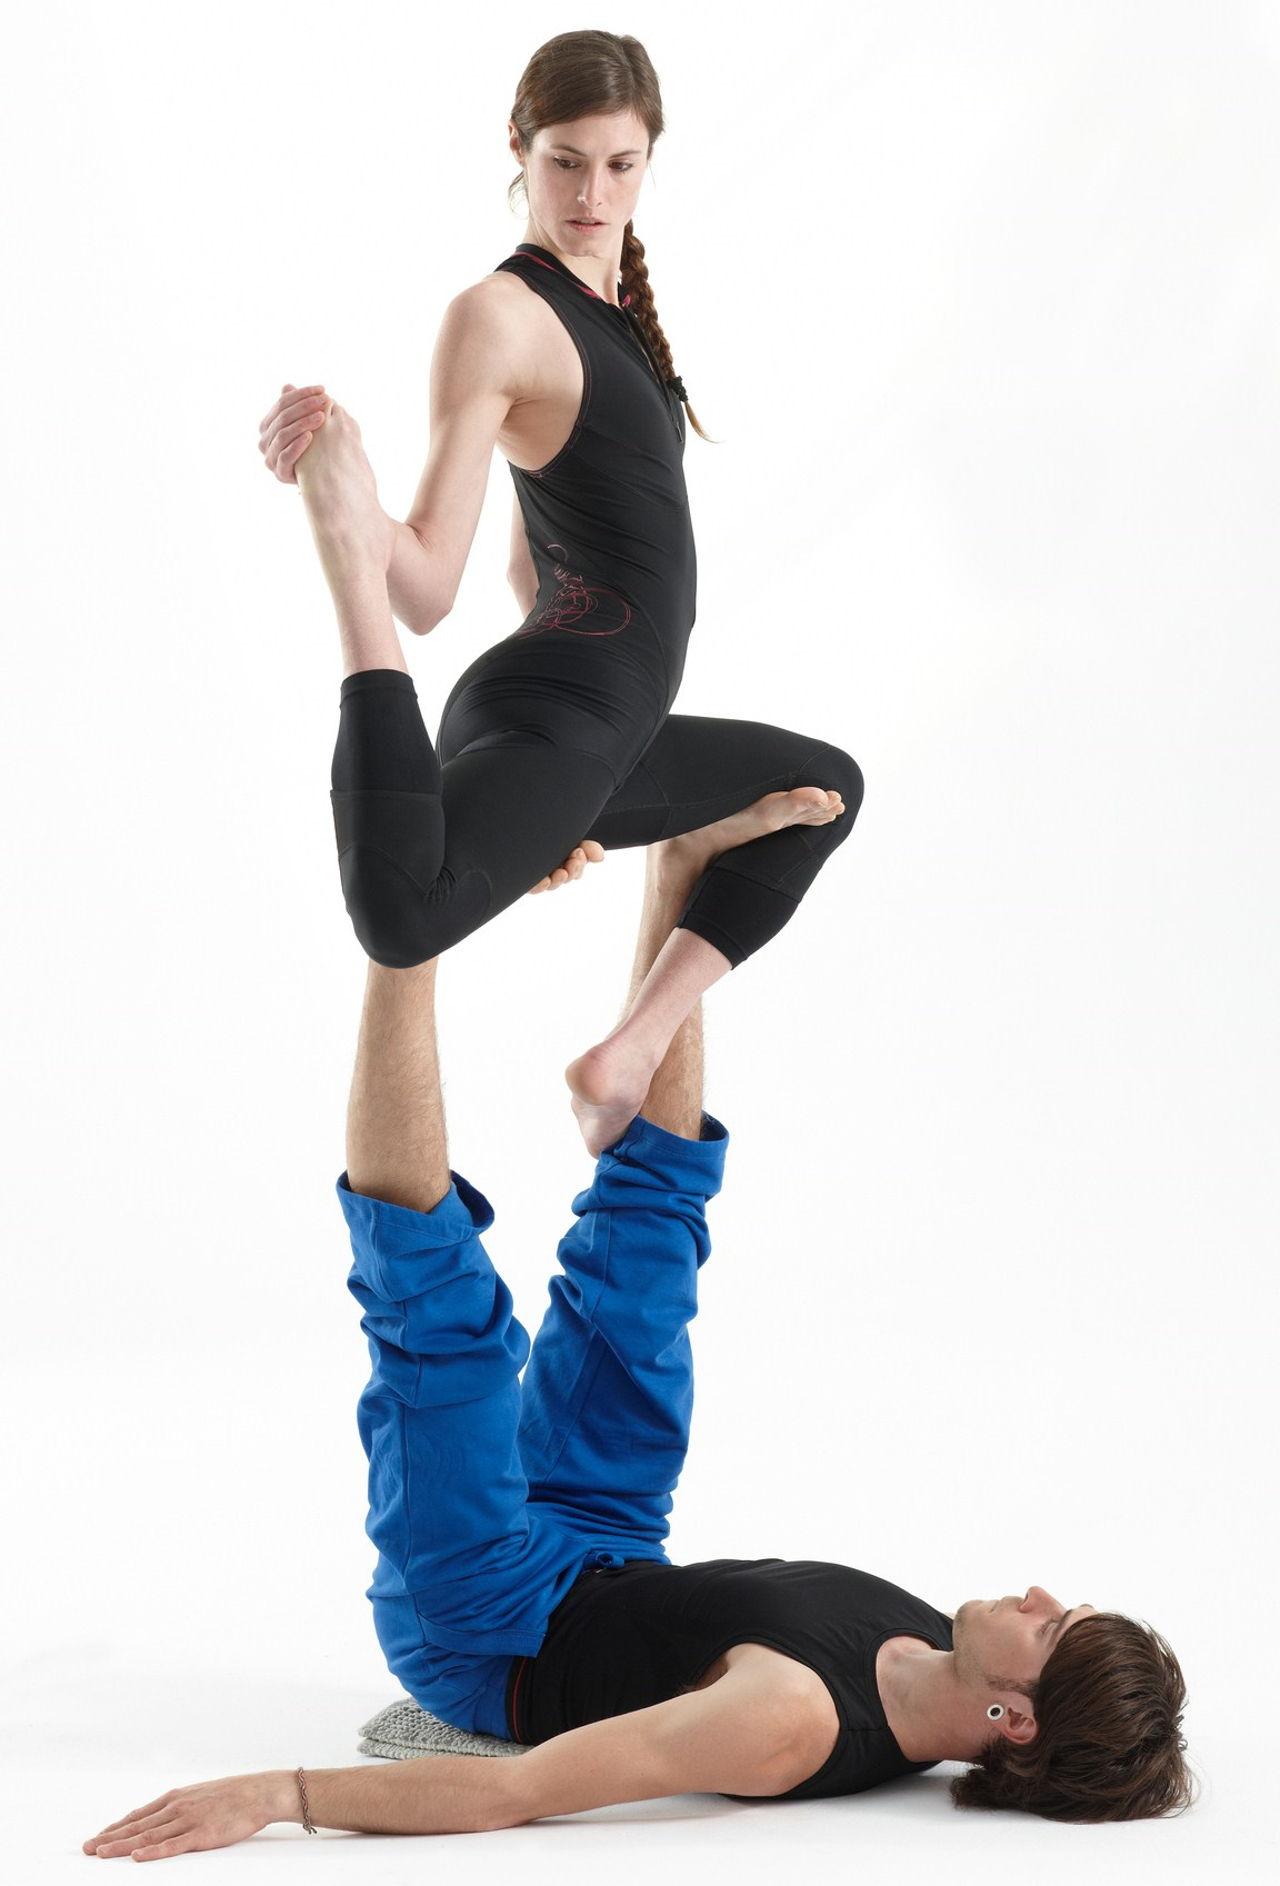 Acro Yoga For Two on Tango Dance Steps